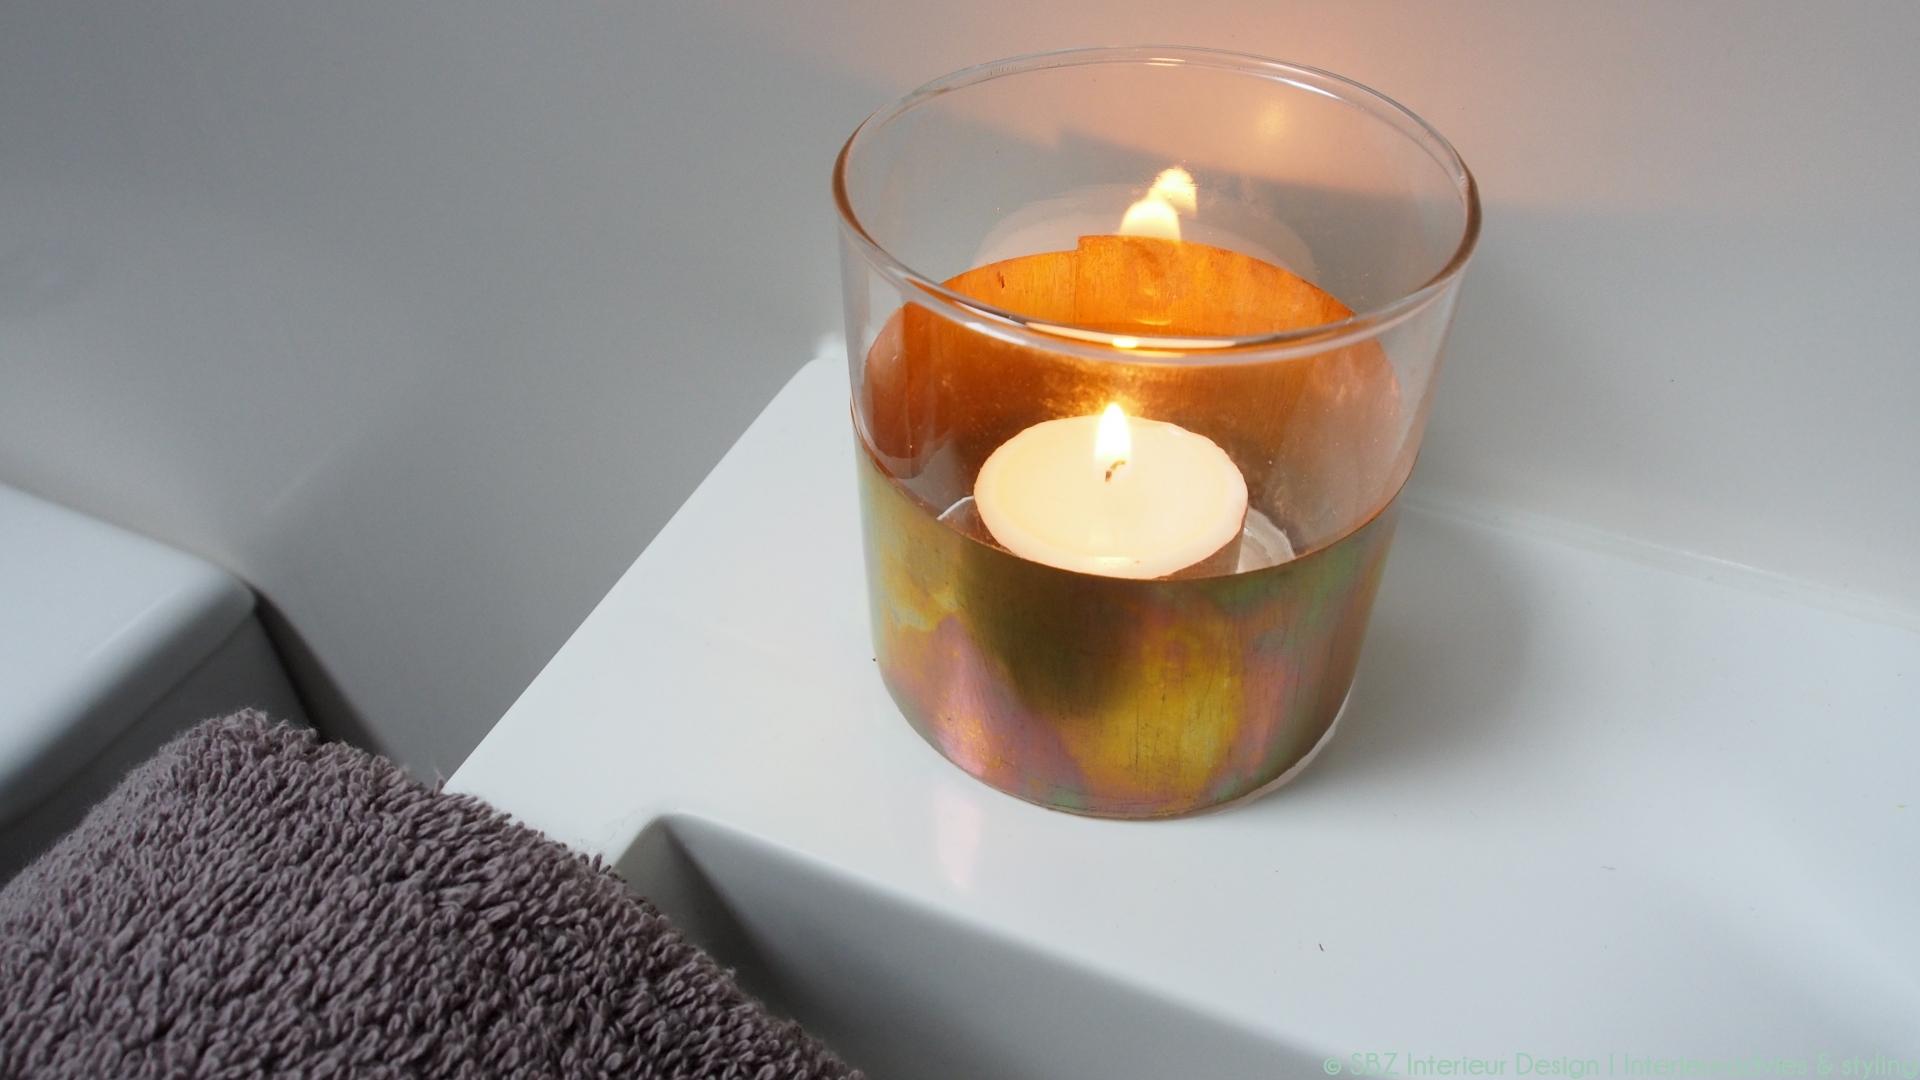 ... Badkamer accessoires mint. Badkamer ideeen zonder bad. Badkamer